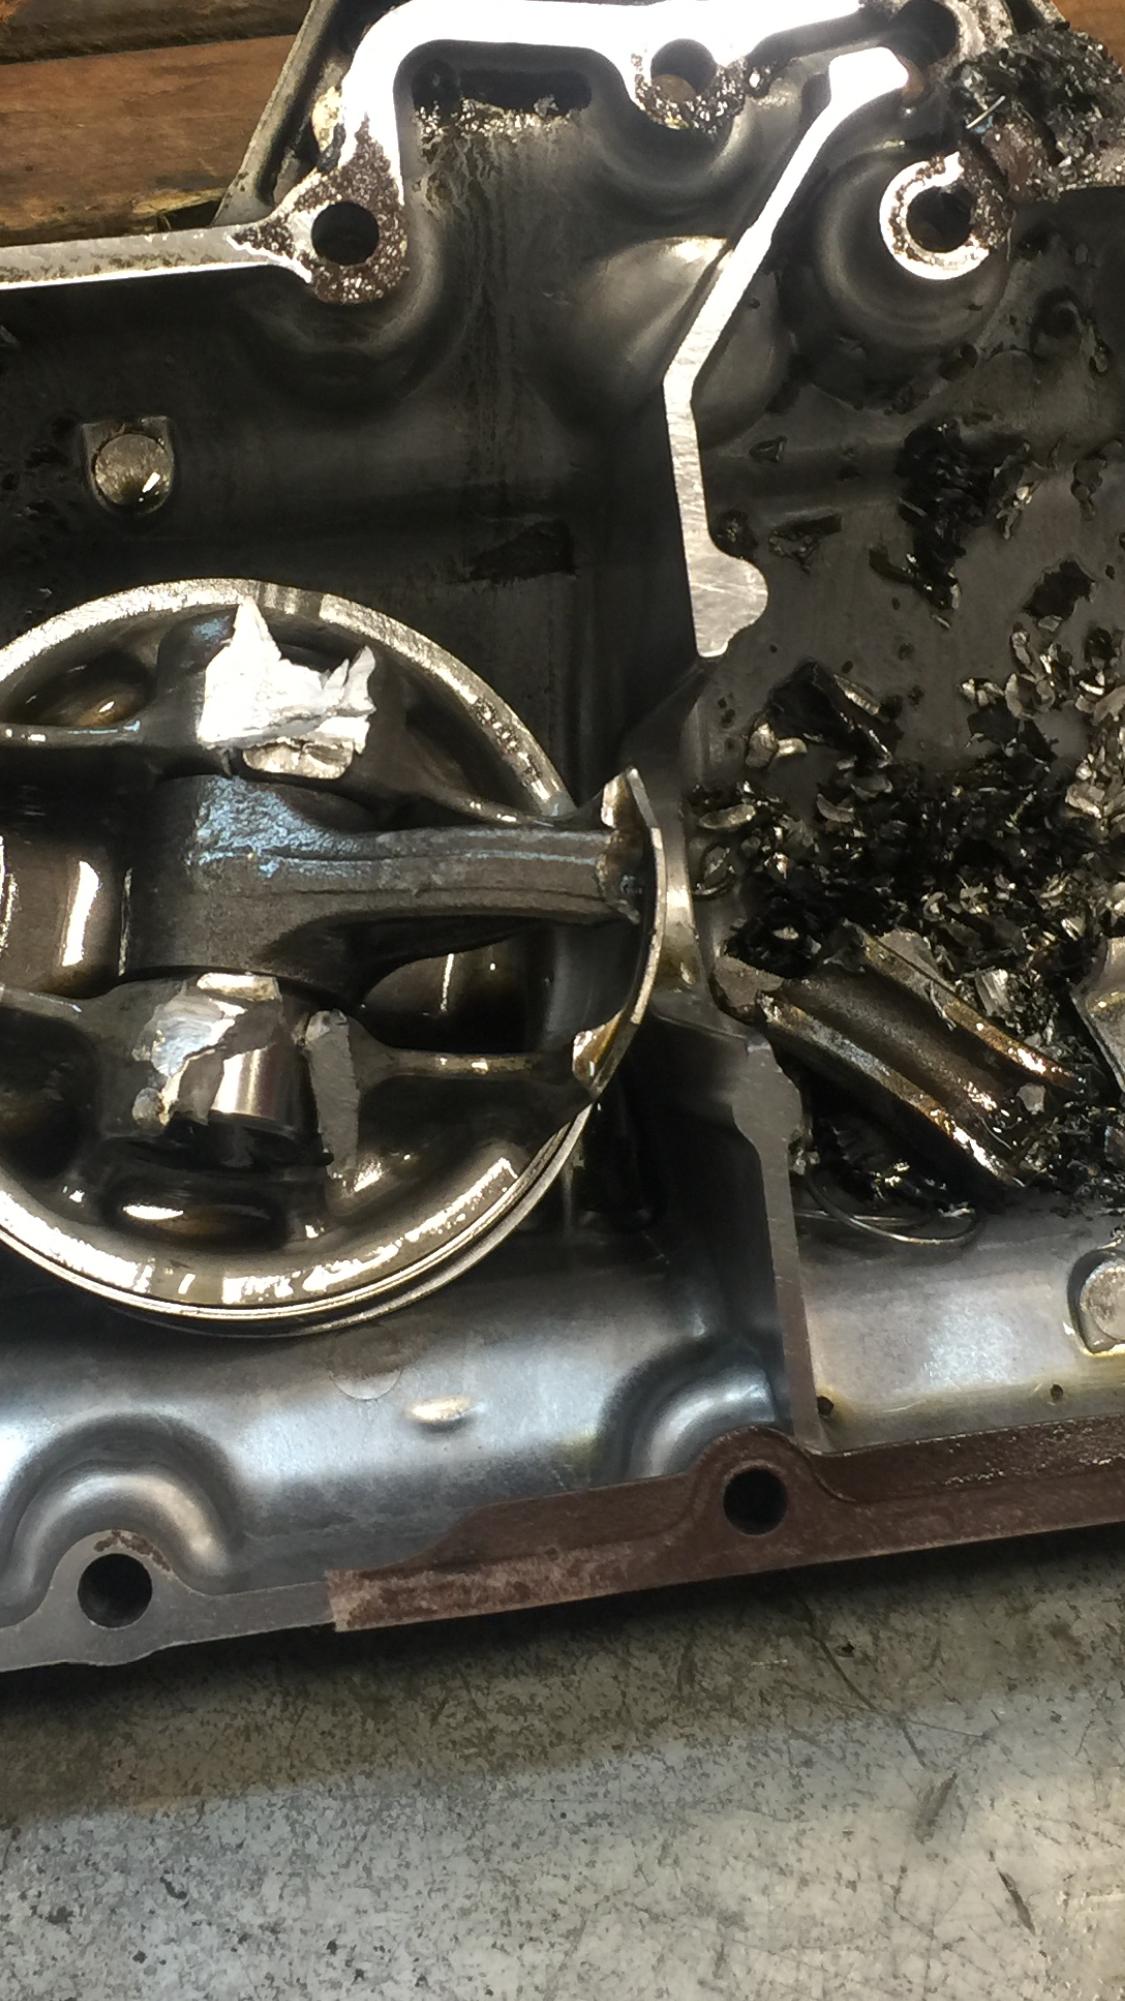 Blown YXZ engine at 15 hours | Yamaha YXZ Forums